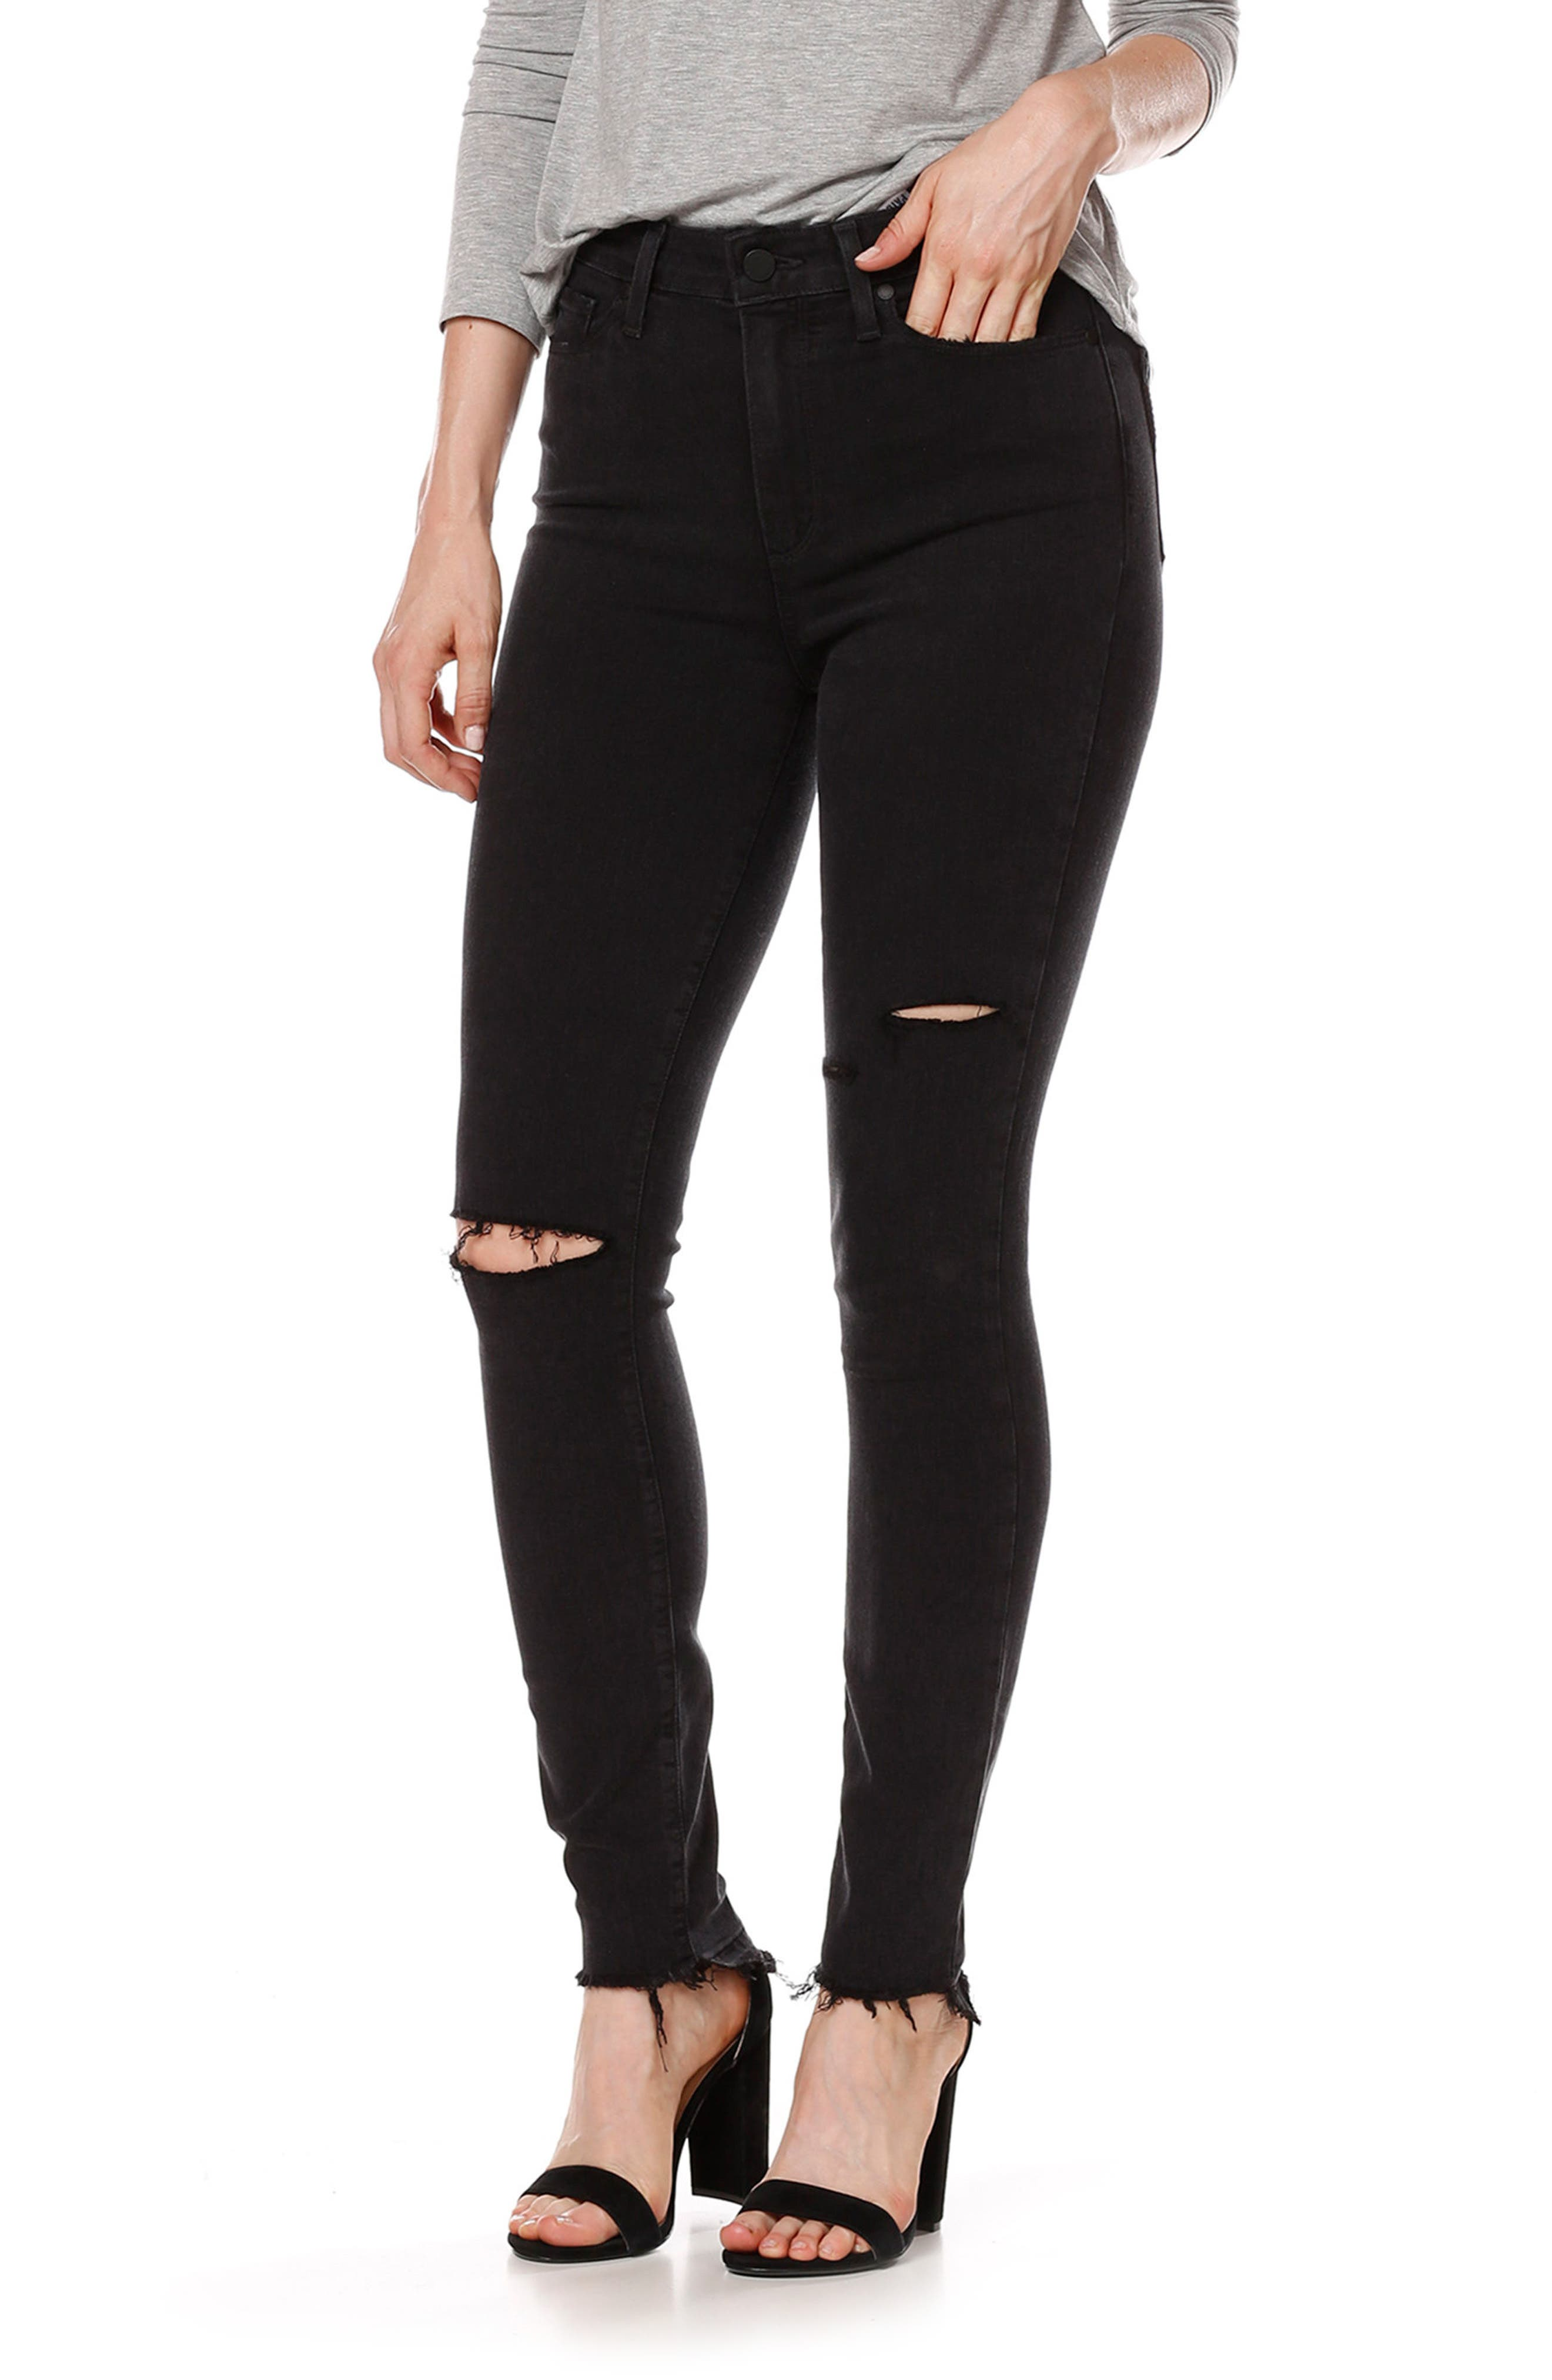 Transcend - Margot High Waist Ankle Skinny Jeans,                         Main,                         color, 001